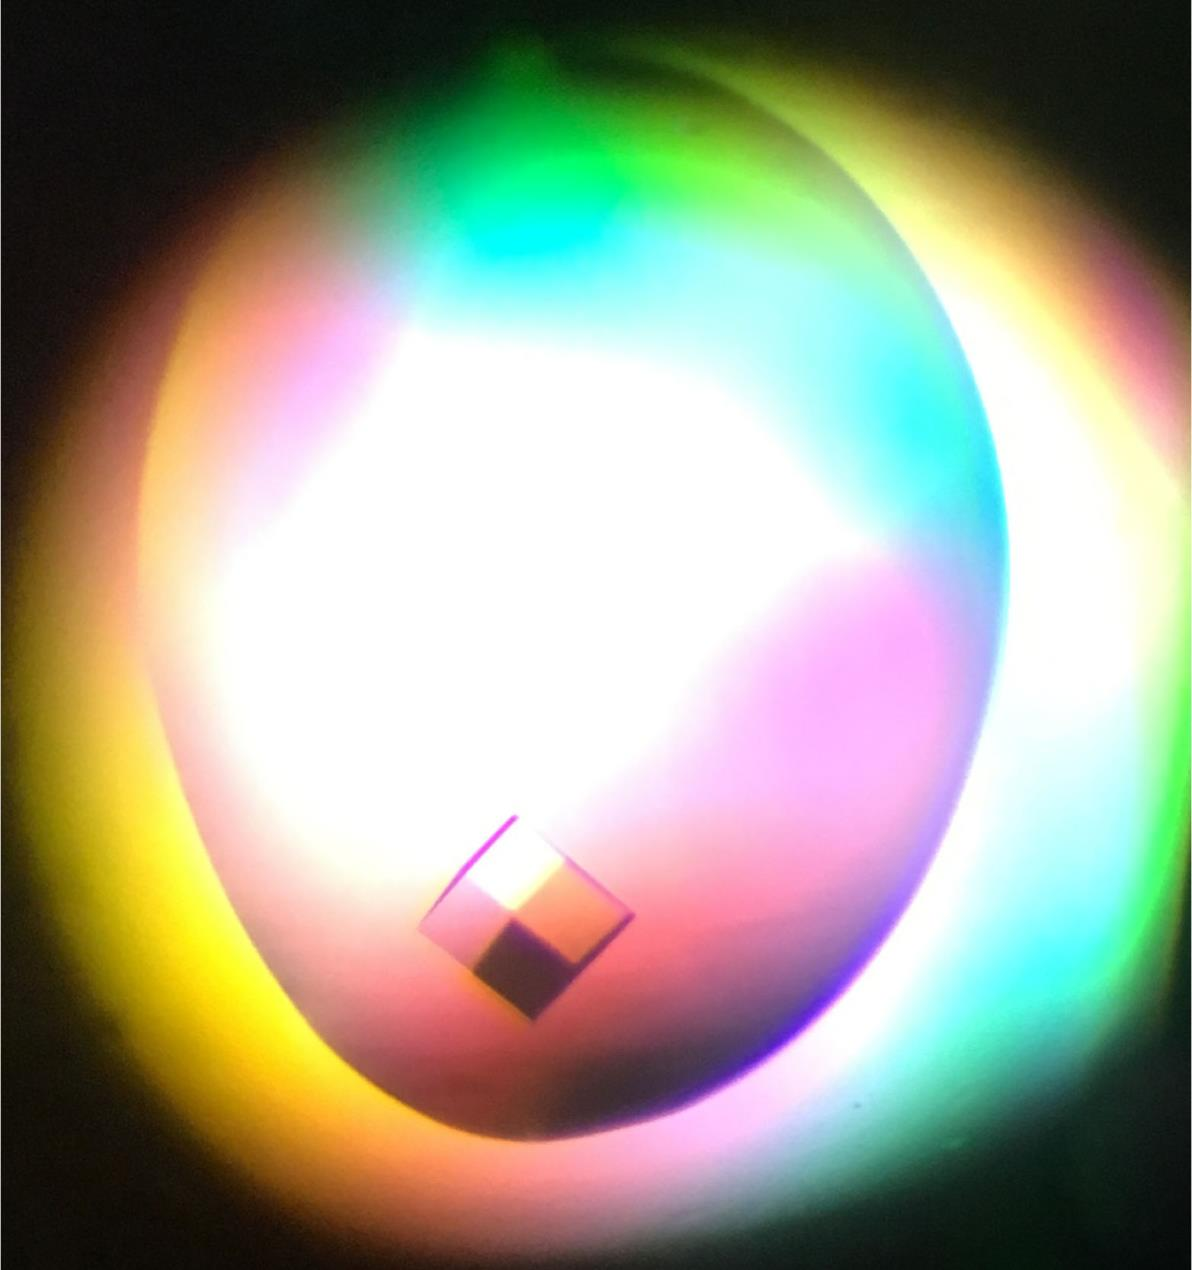 crystal_image1